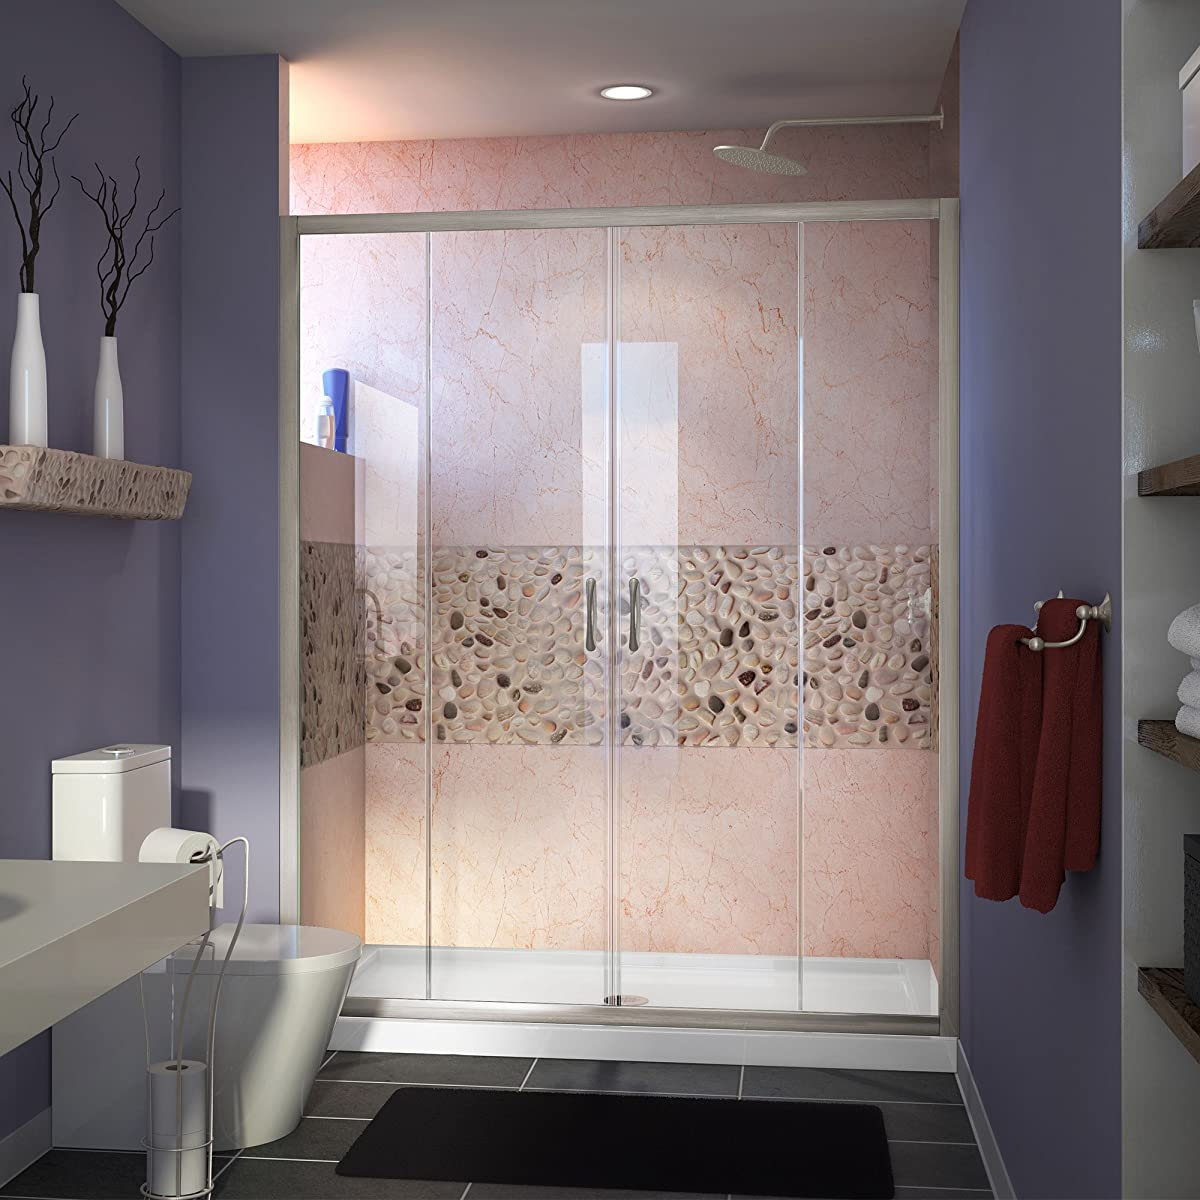 "DreamLine Visions 56-60 in. Width, Frameless Sliding Shower Door, 1/4"" Glass, Brushed Nickel Finish"